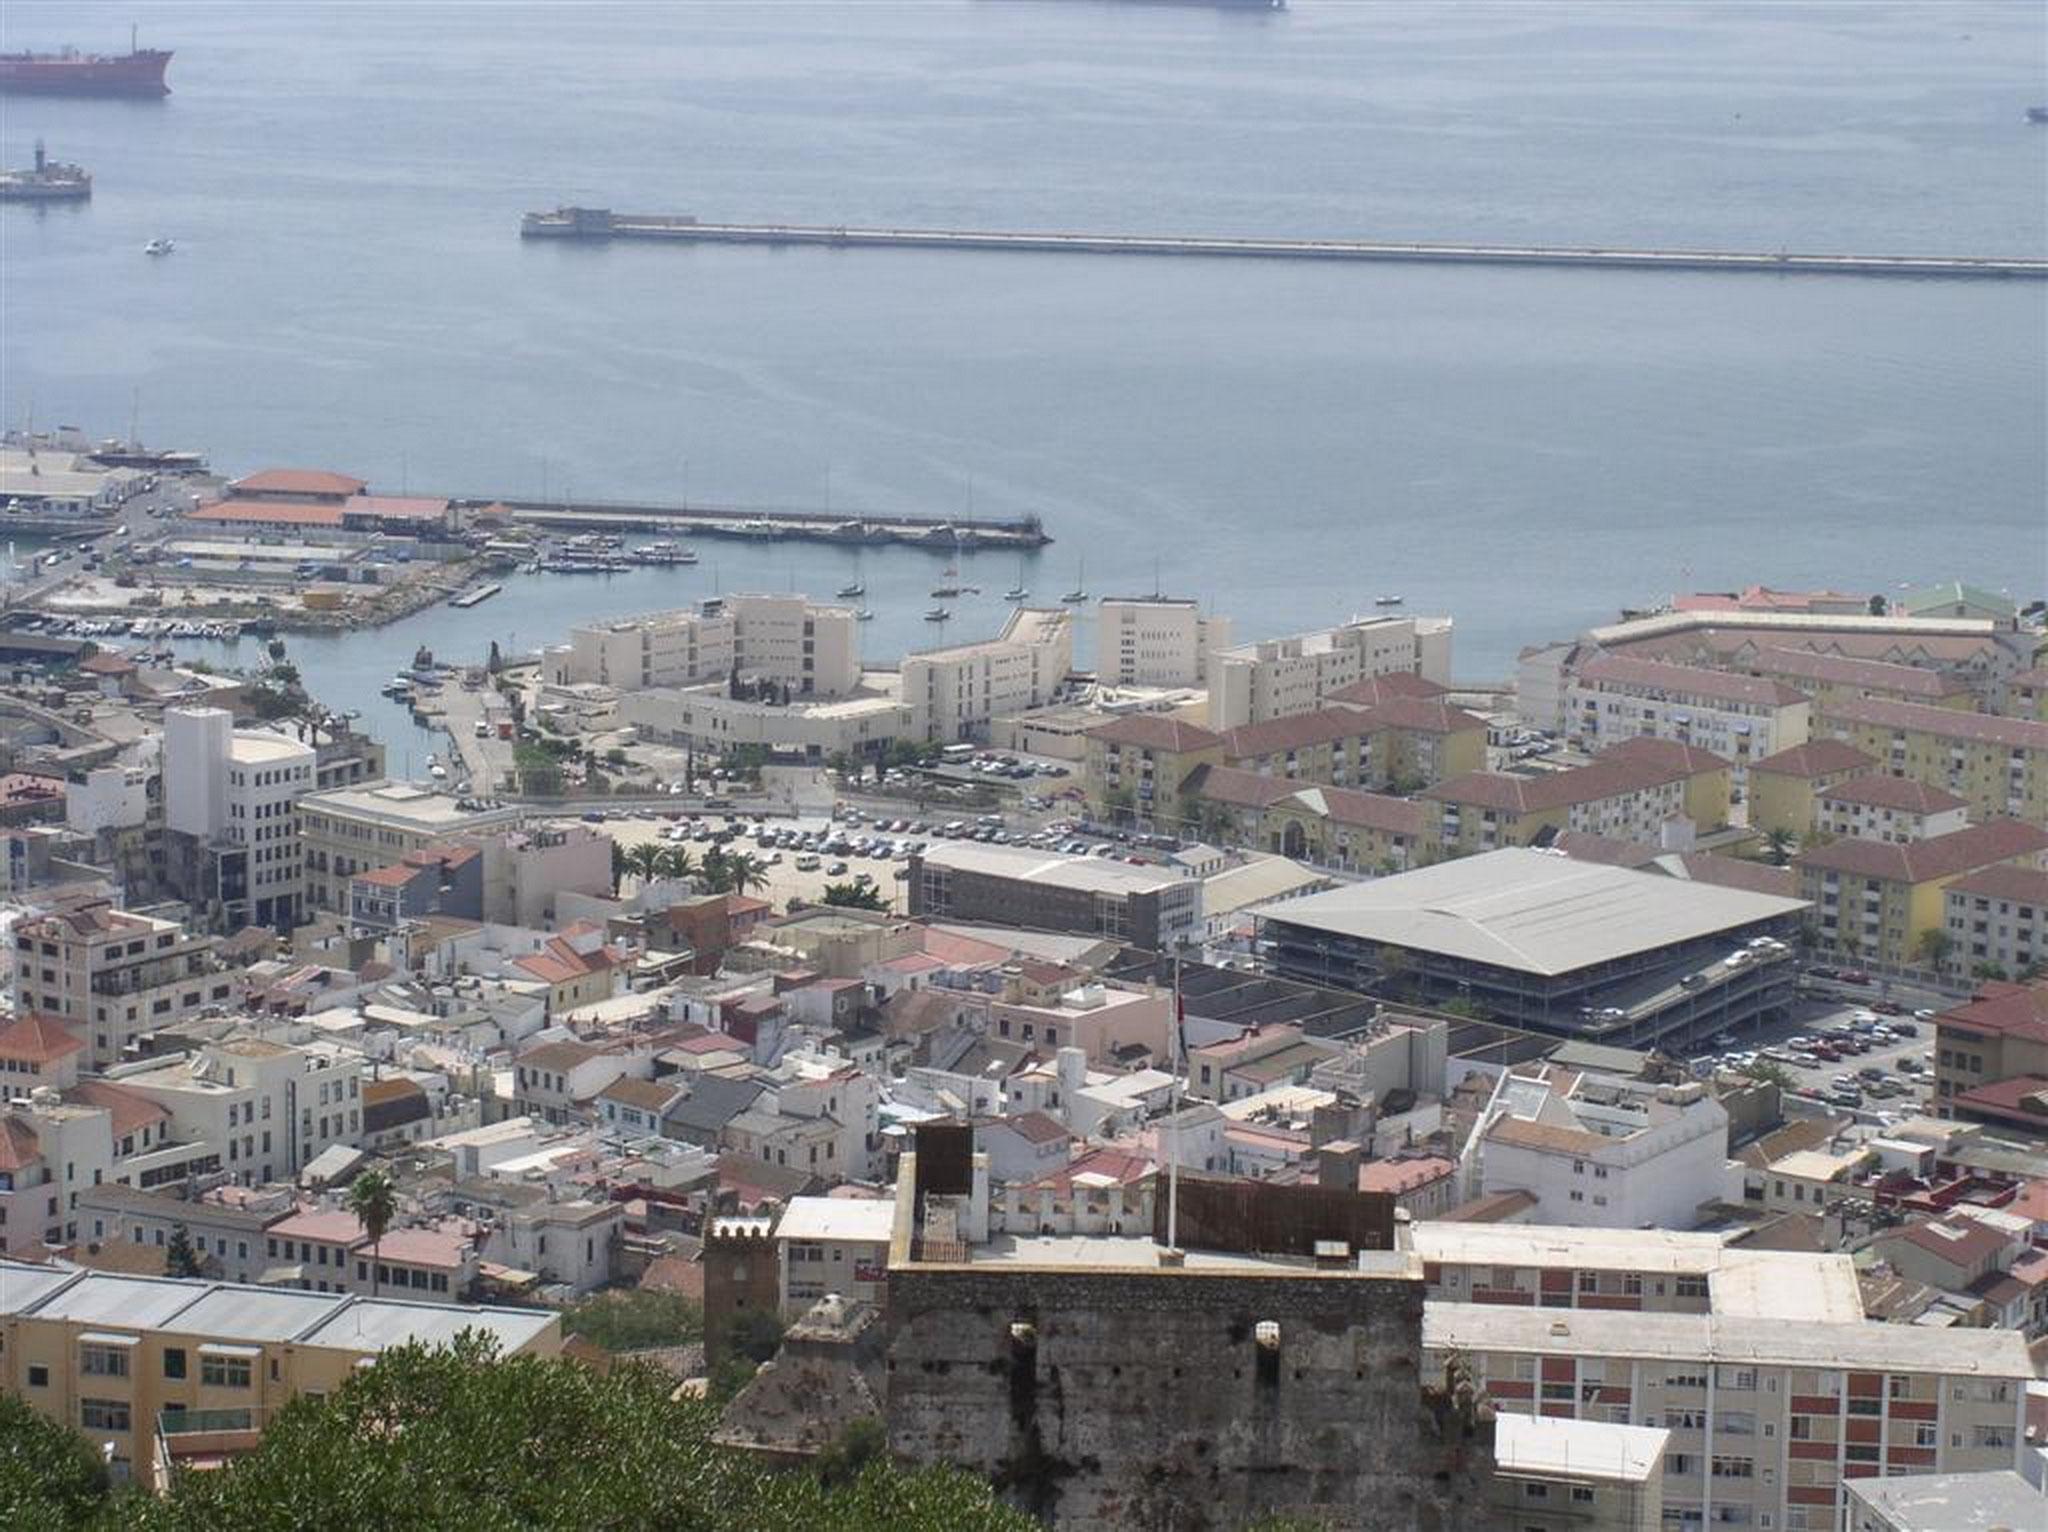 Near Cartagena